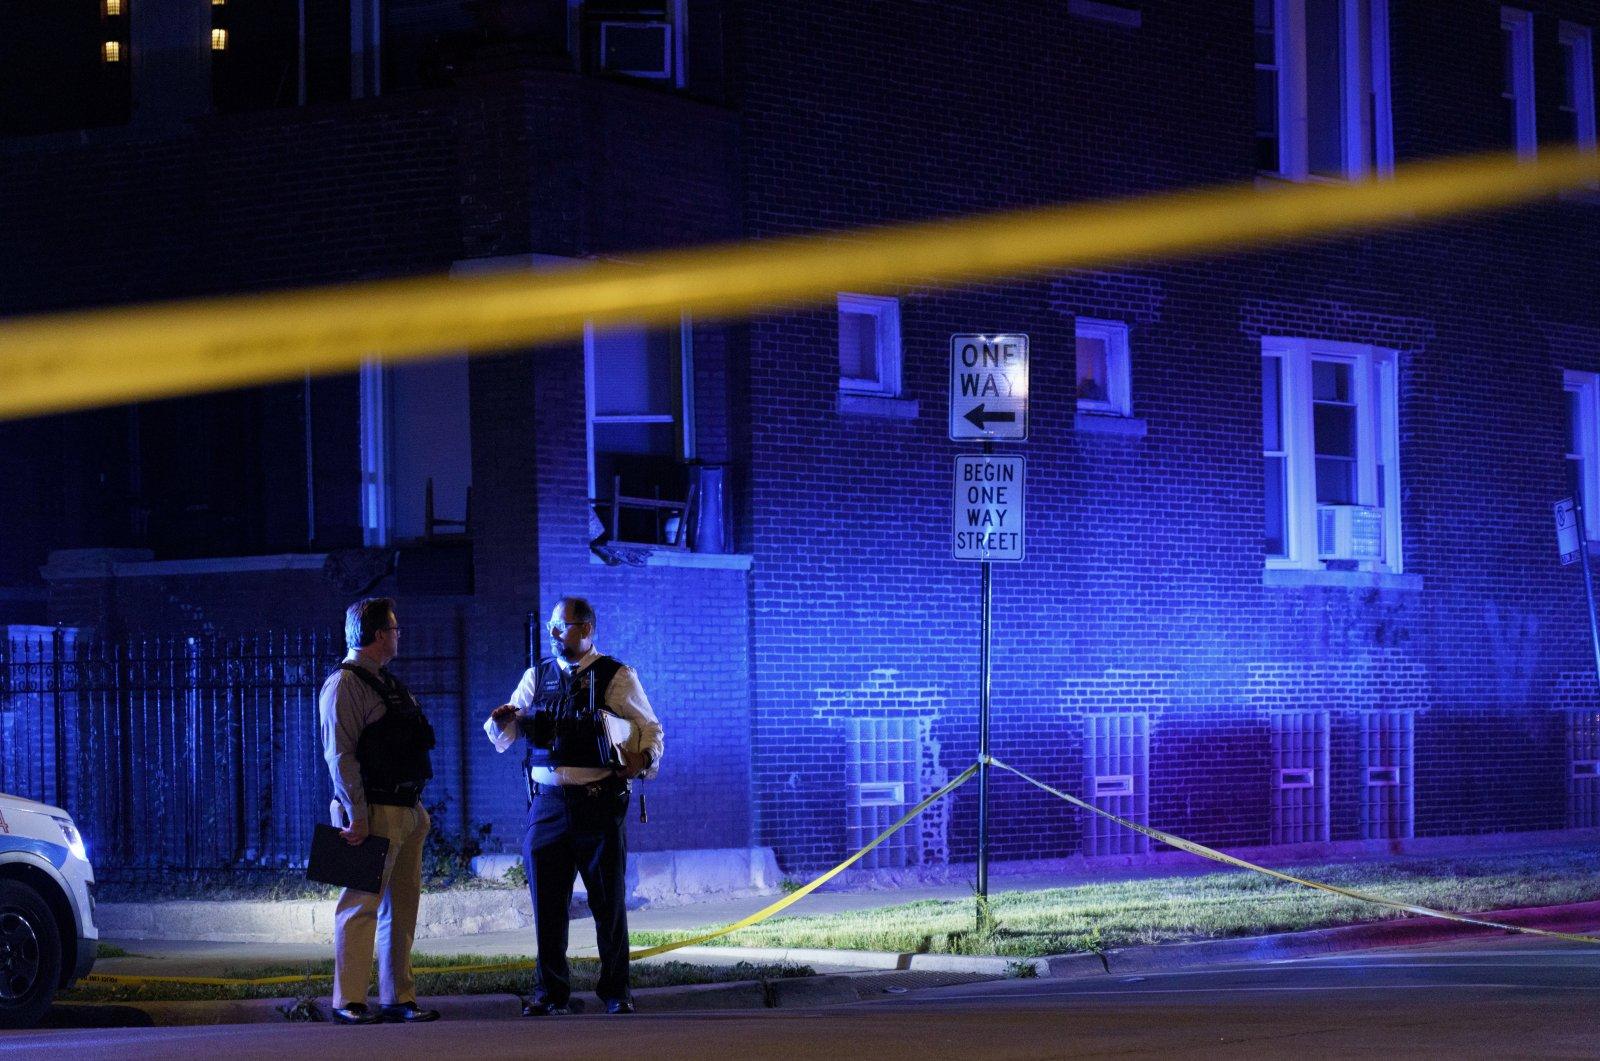 Police work the scene of a shooting in the East Garfield Park neighborhood, Chicago, U.S., June 15, 2021. (Armando L. Sanchez/Chicago Tribune via AP)